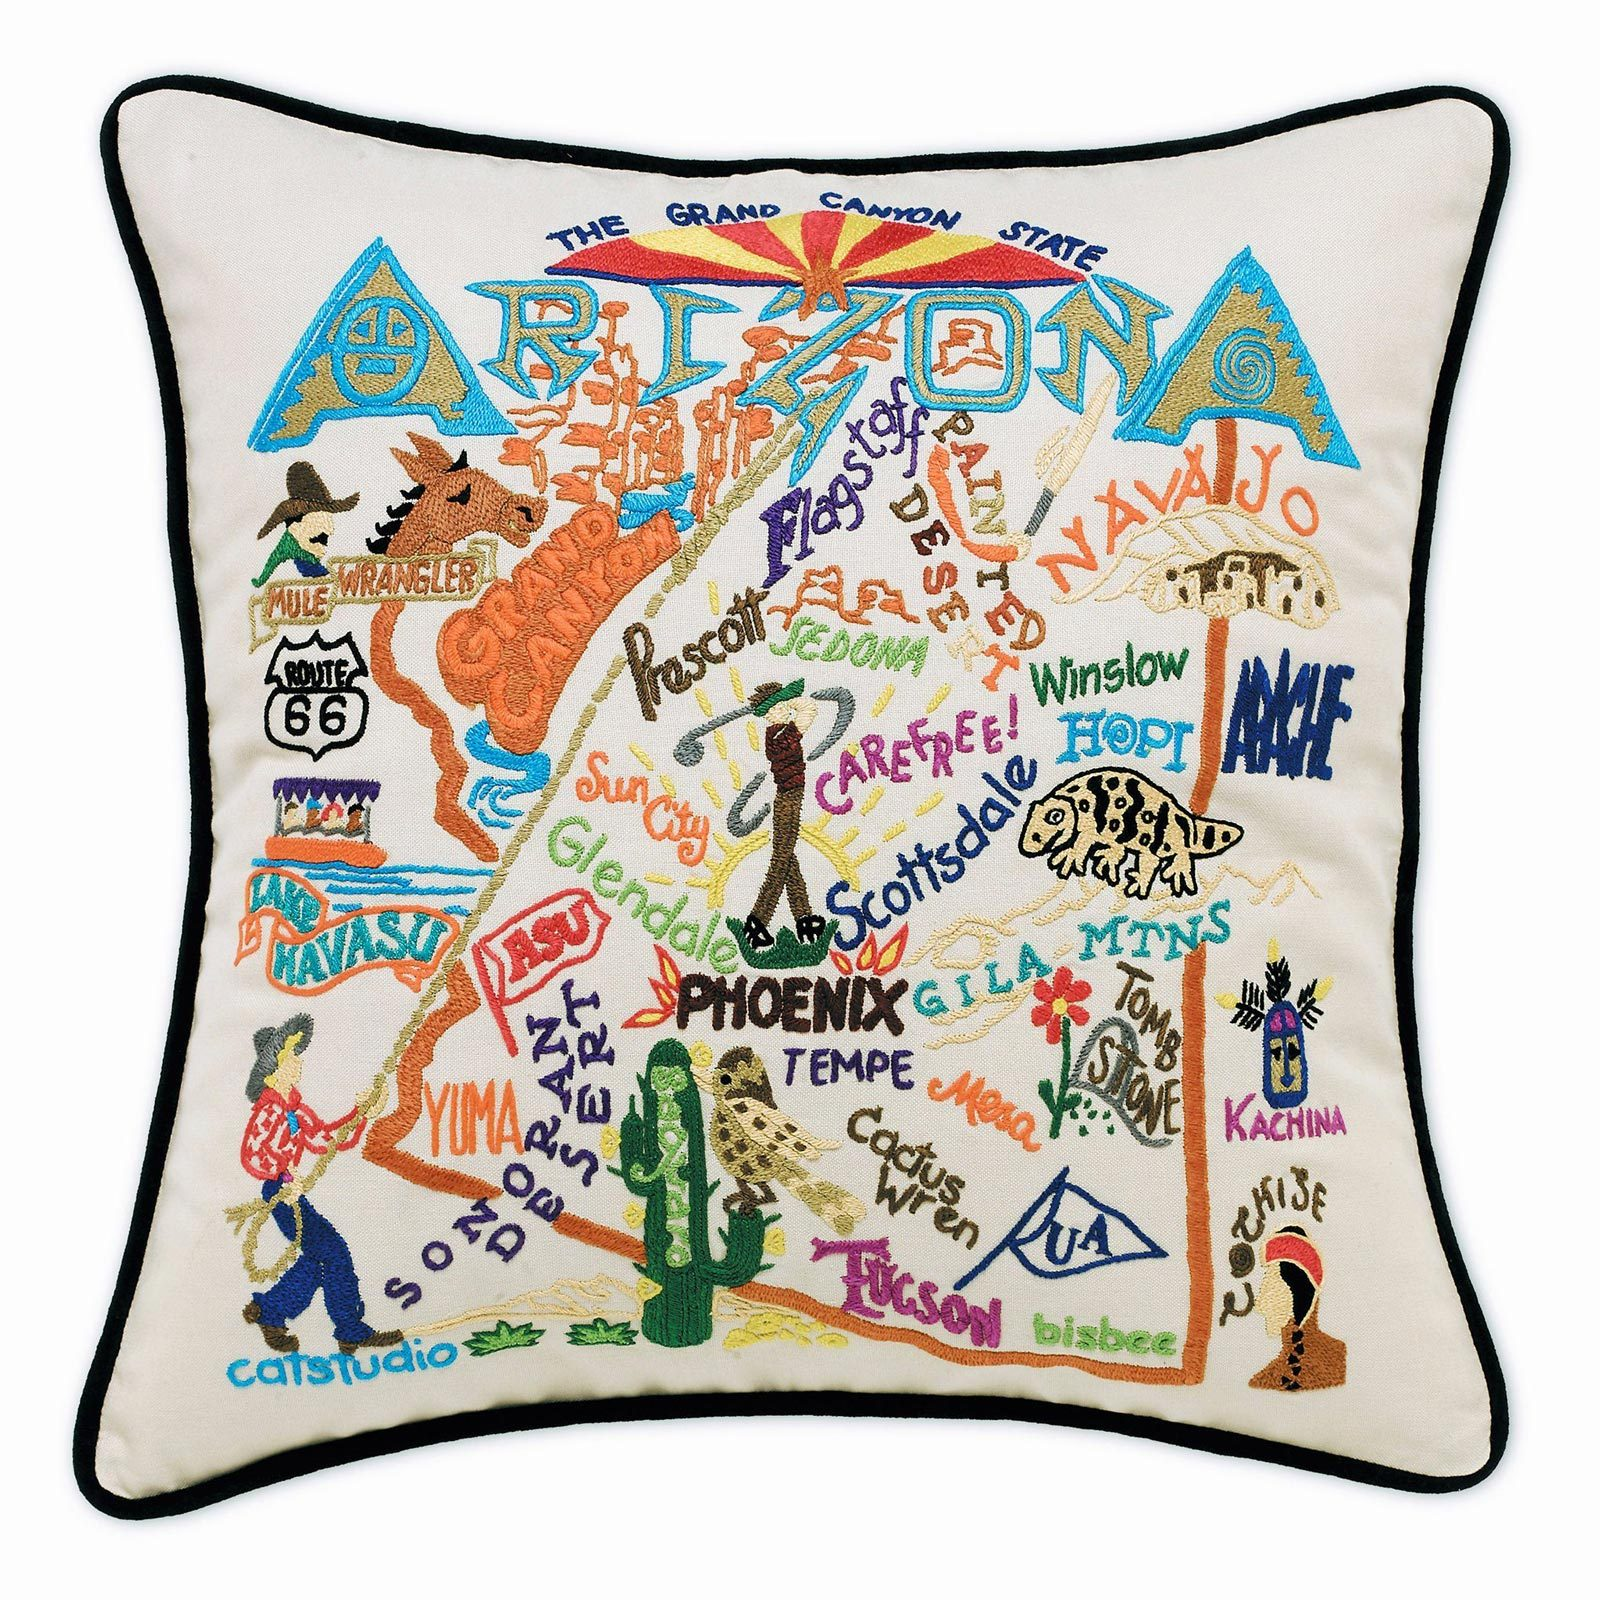 Catstudio Hand-Embroidered Pillow